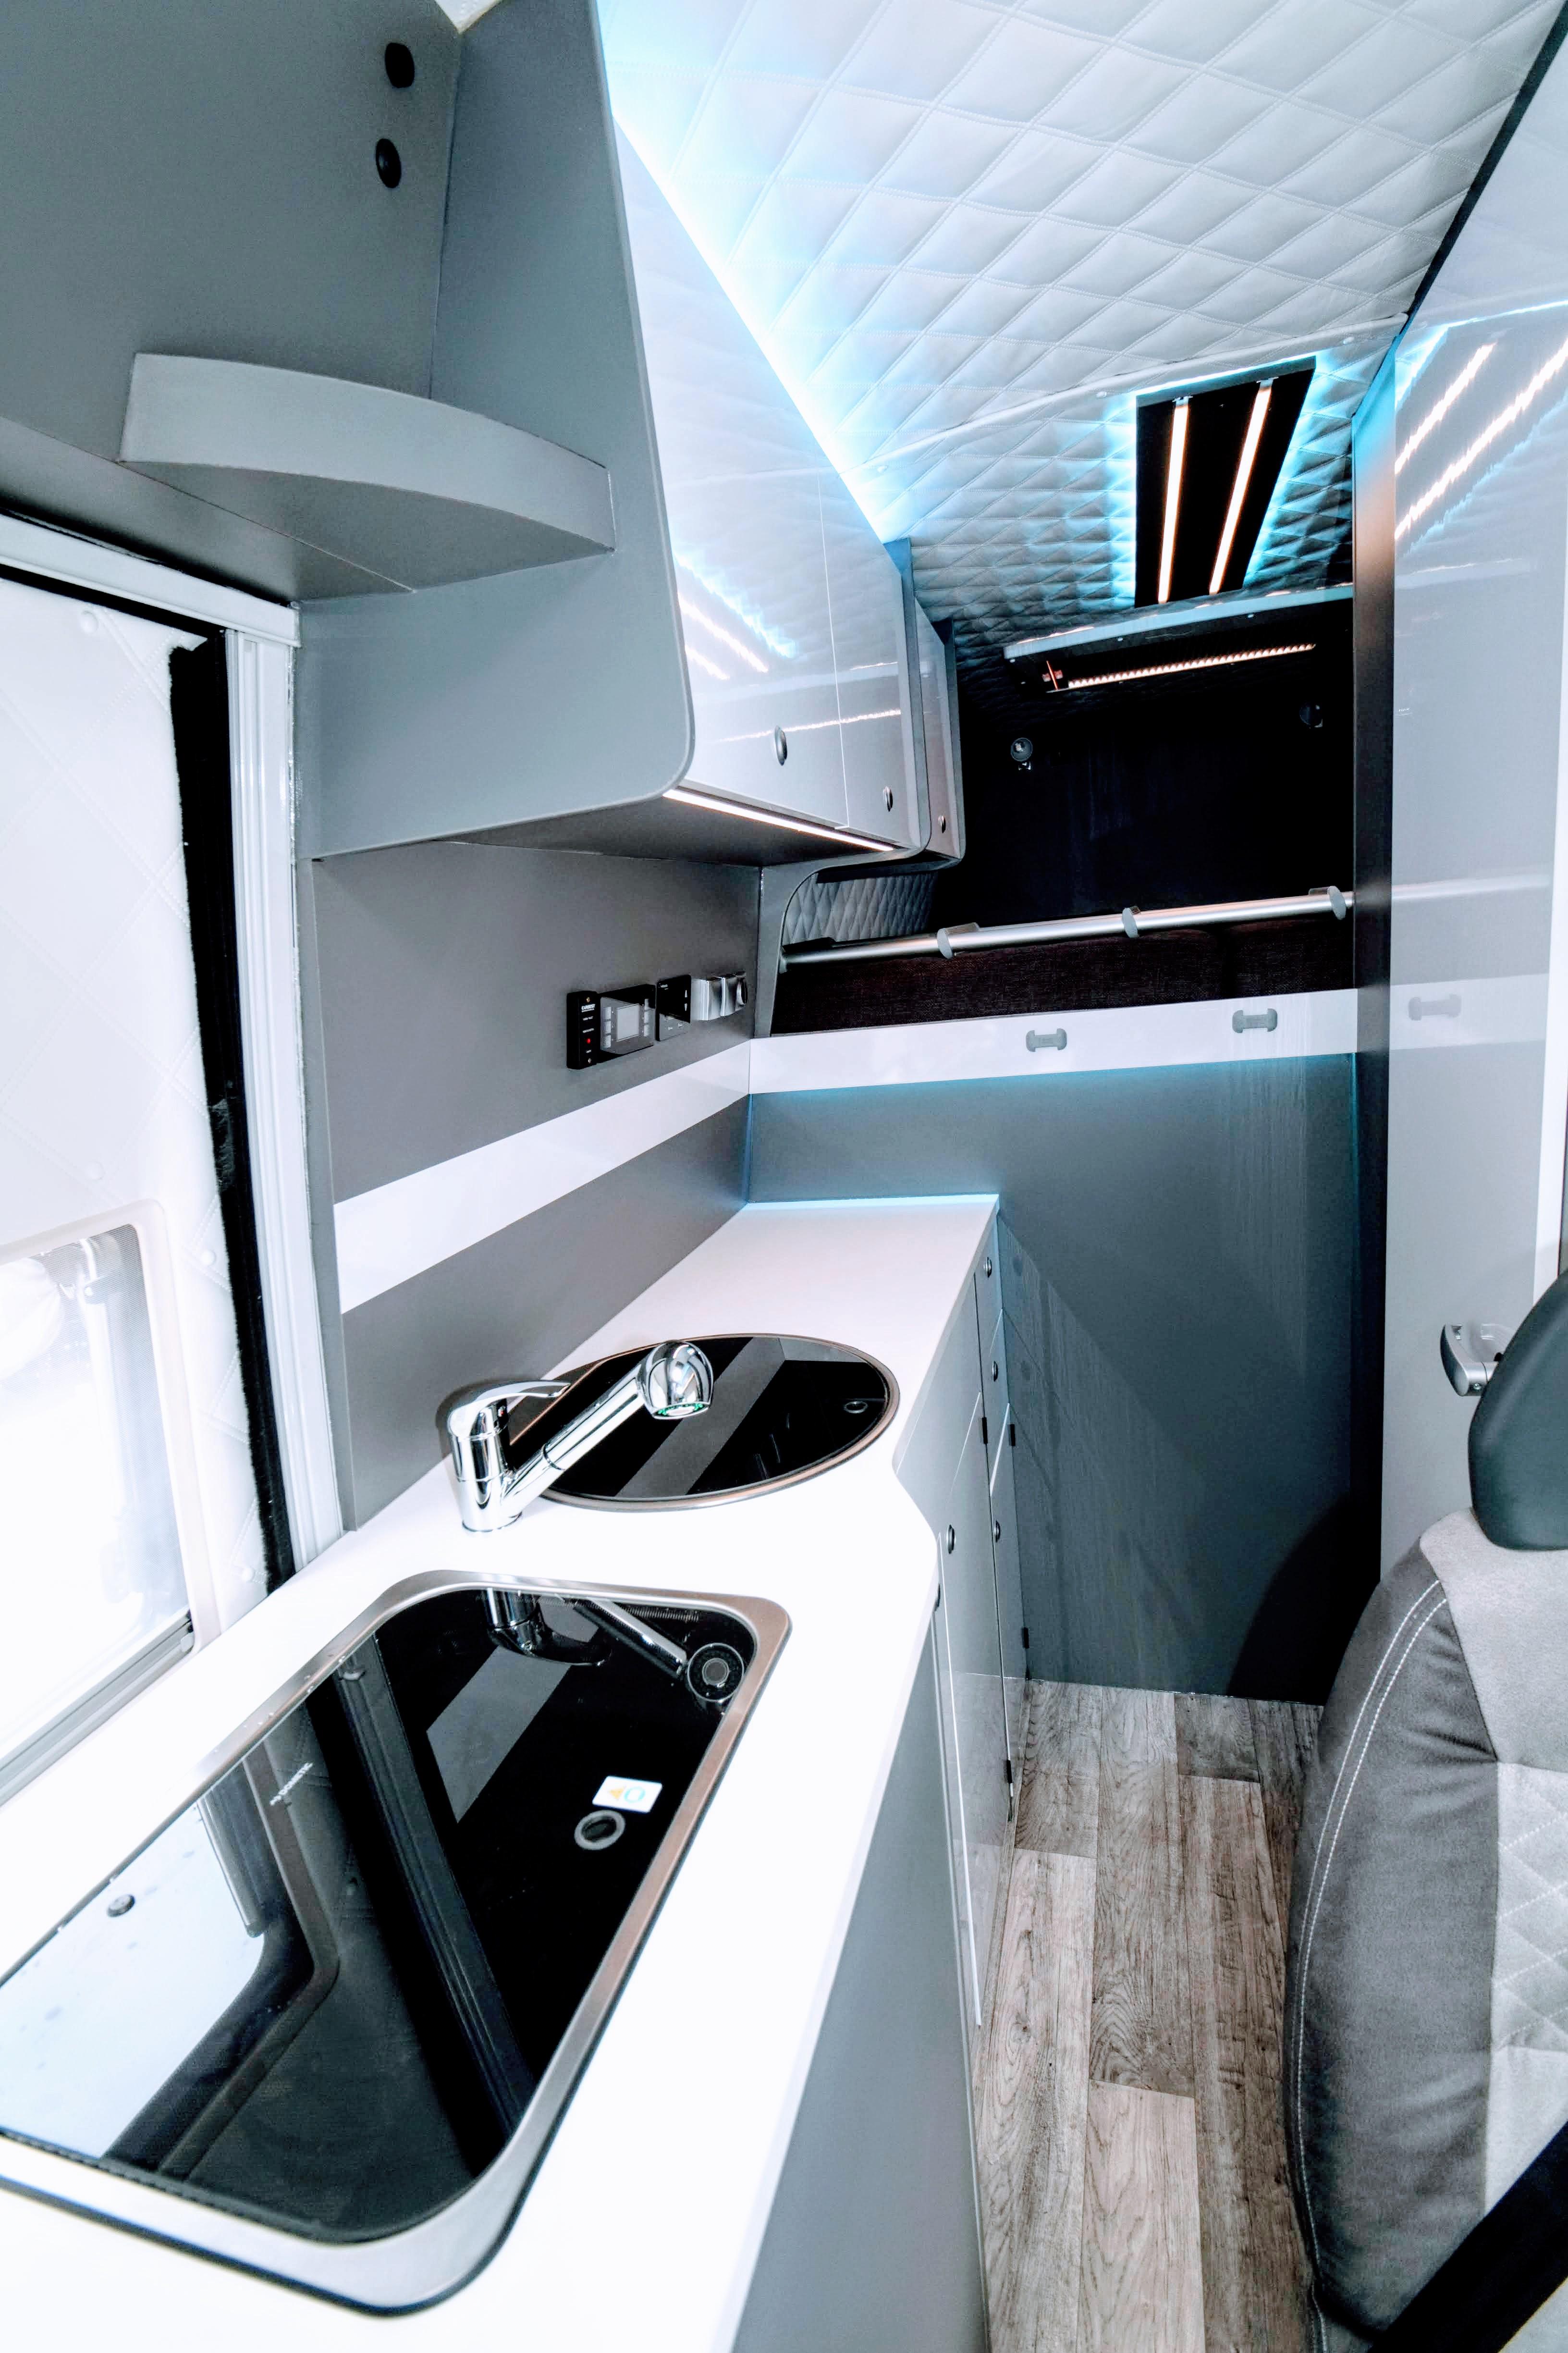 vw crafter vw crafter renntransporter auf leichtbau. Black Bedroom Furniture Sets. Home Design Ideas